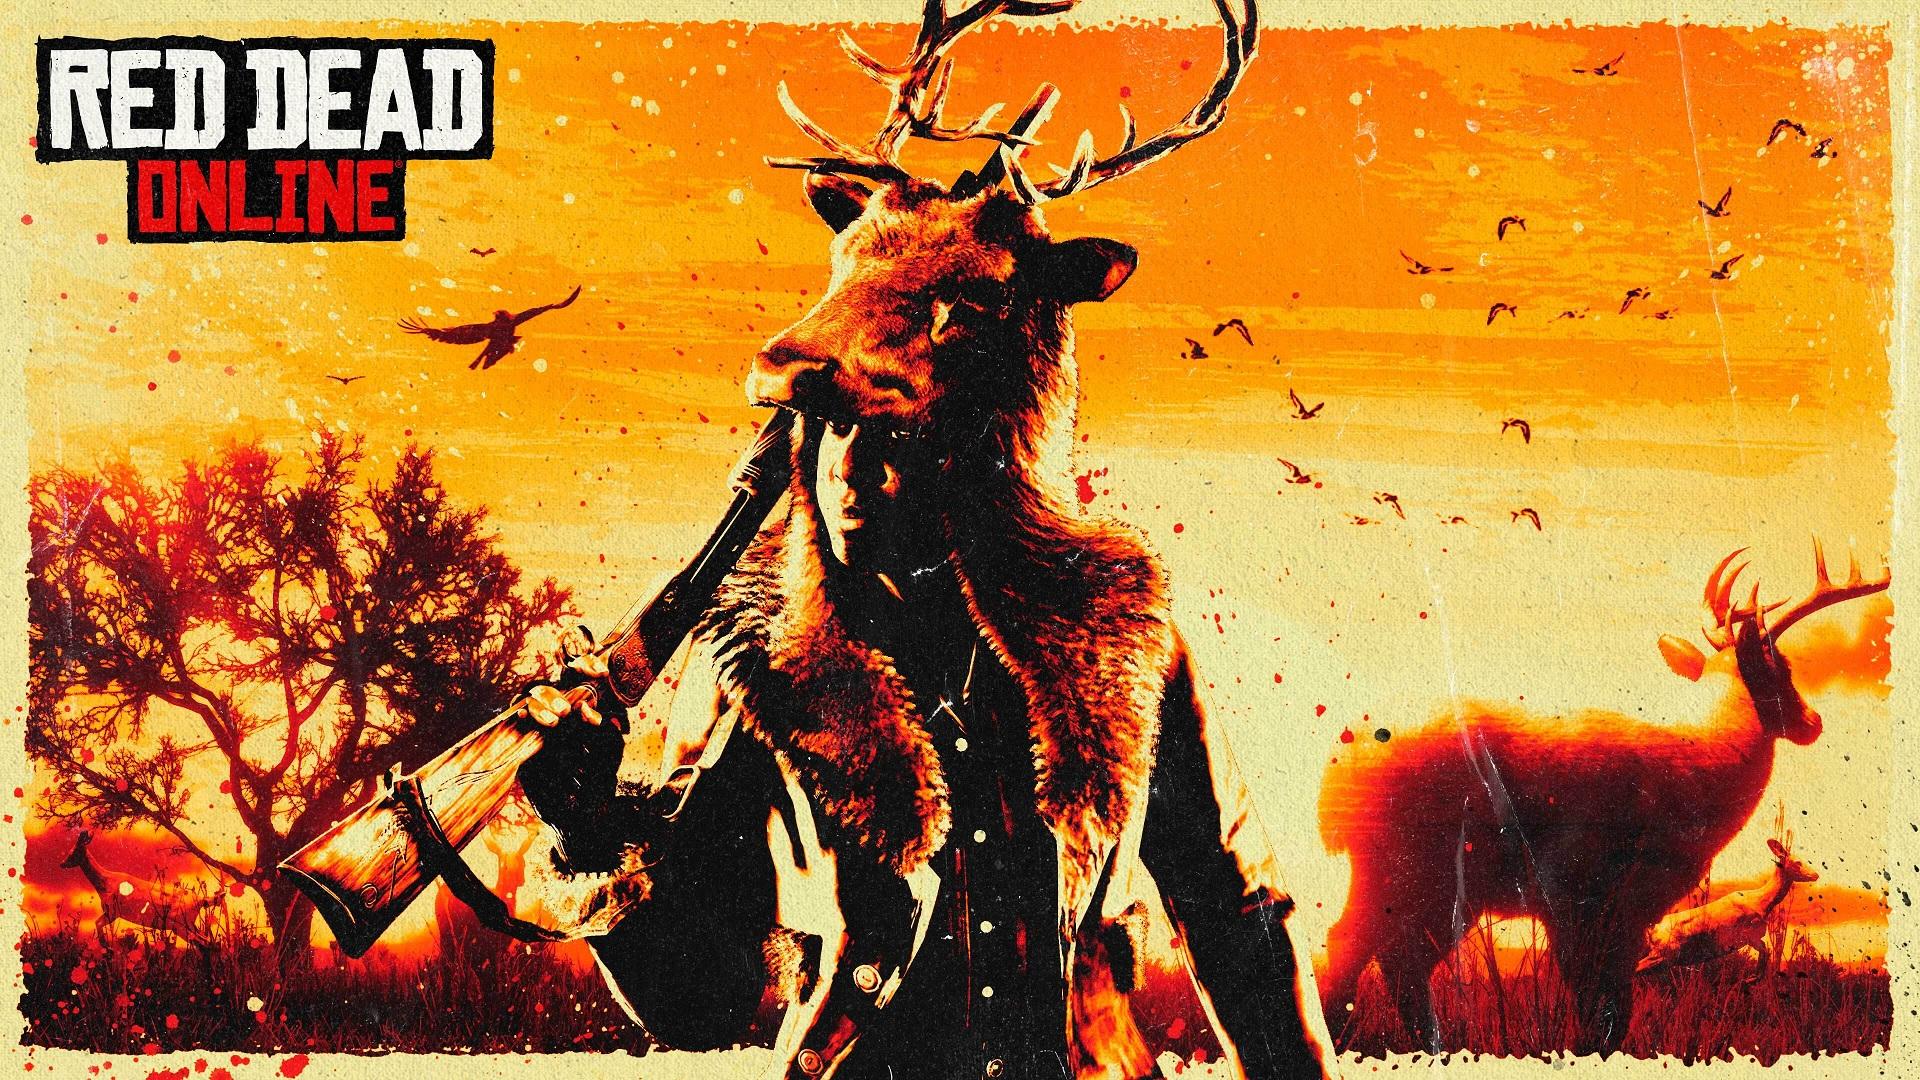 Red-Dead-online-Semaine-Naturaliste